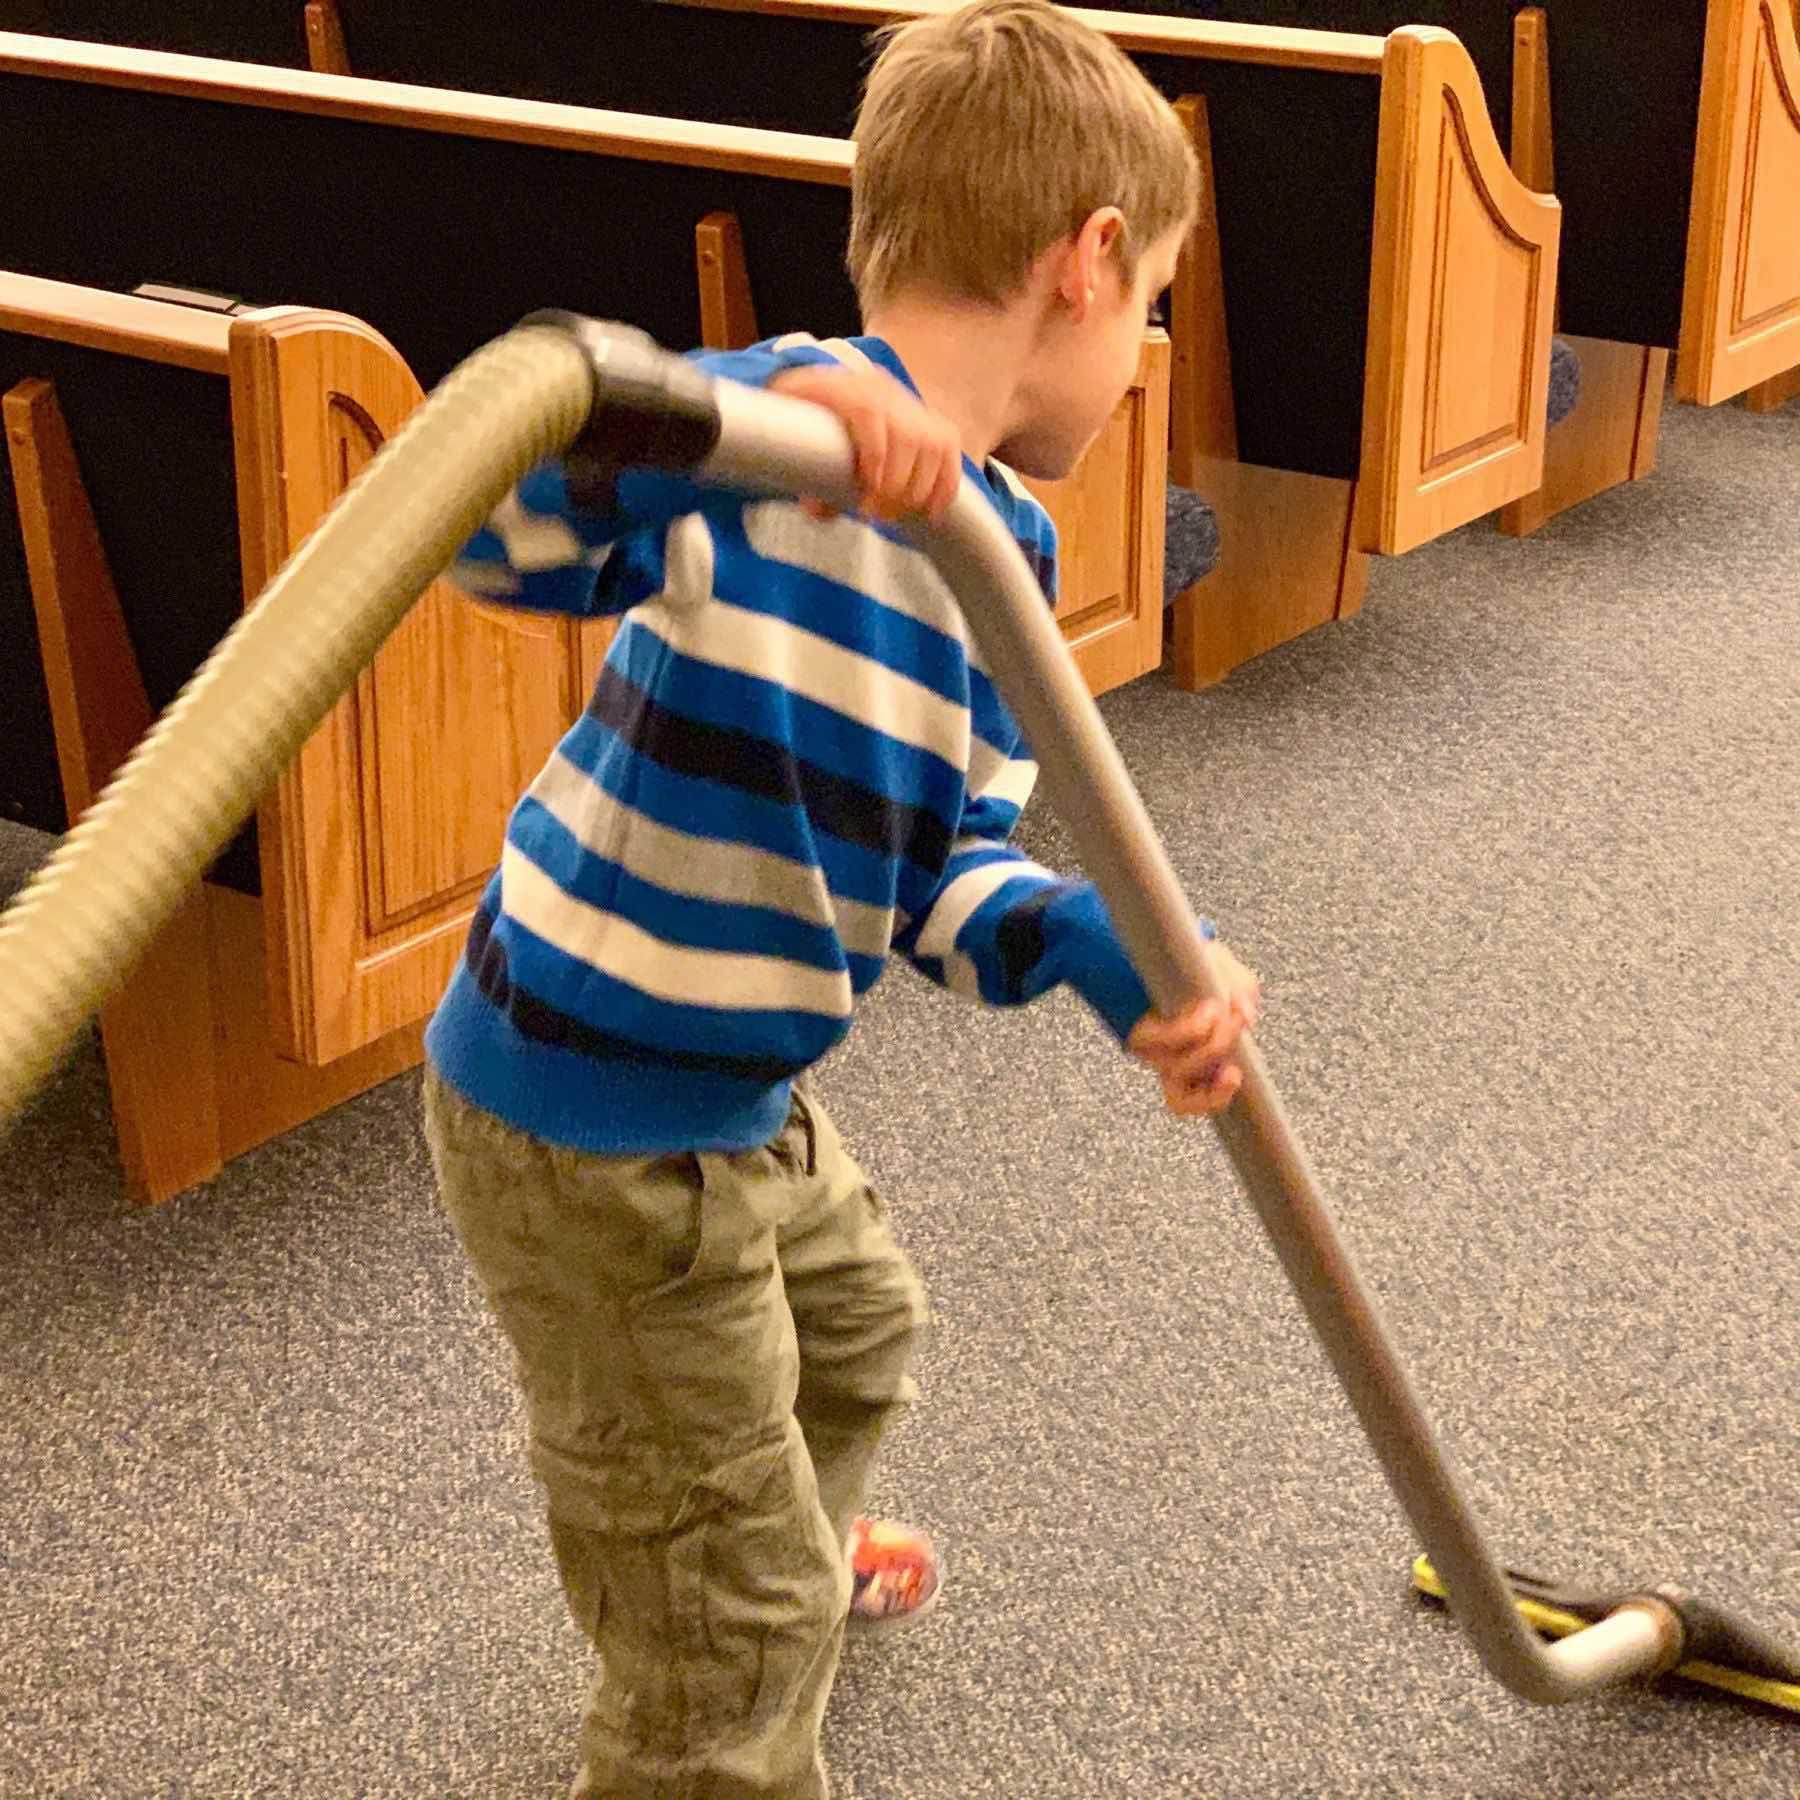 Six-year-old vacuuming the church